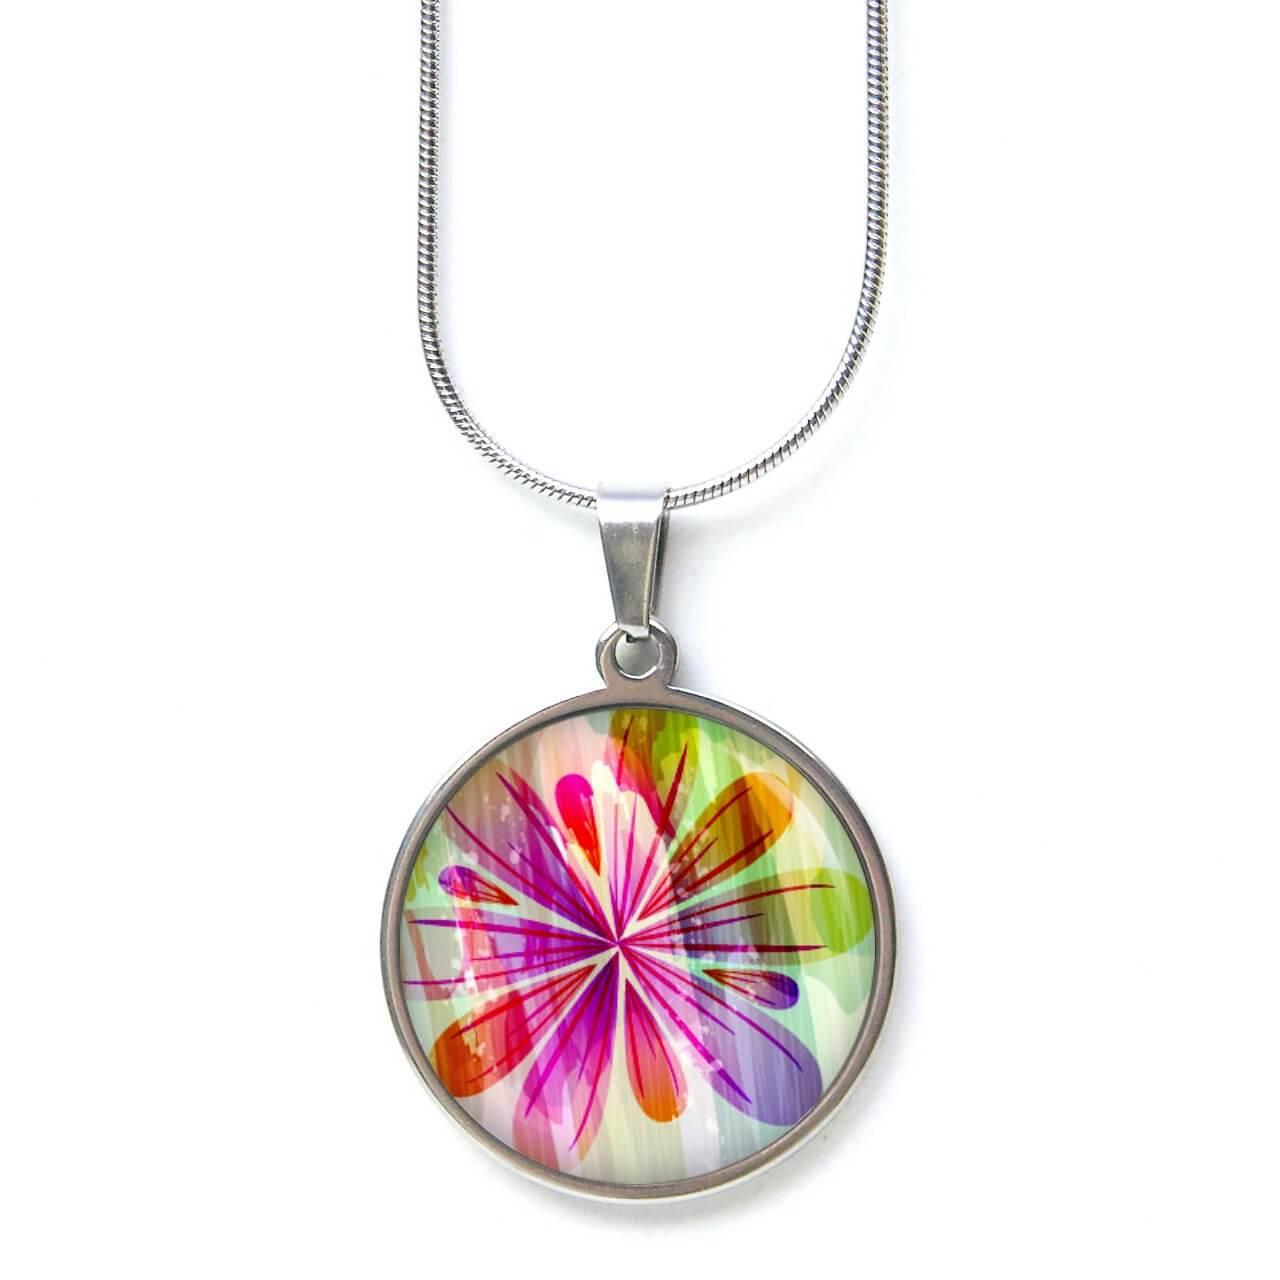 Edelstahl Kette große bunte Regenbogen Blume Flower Power